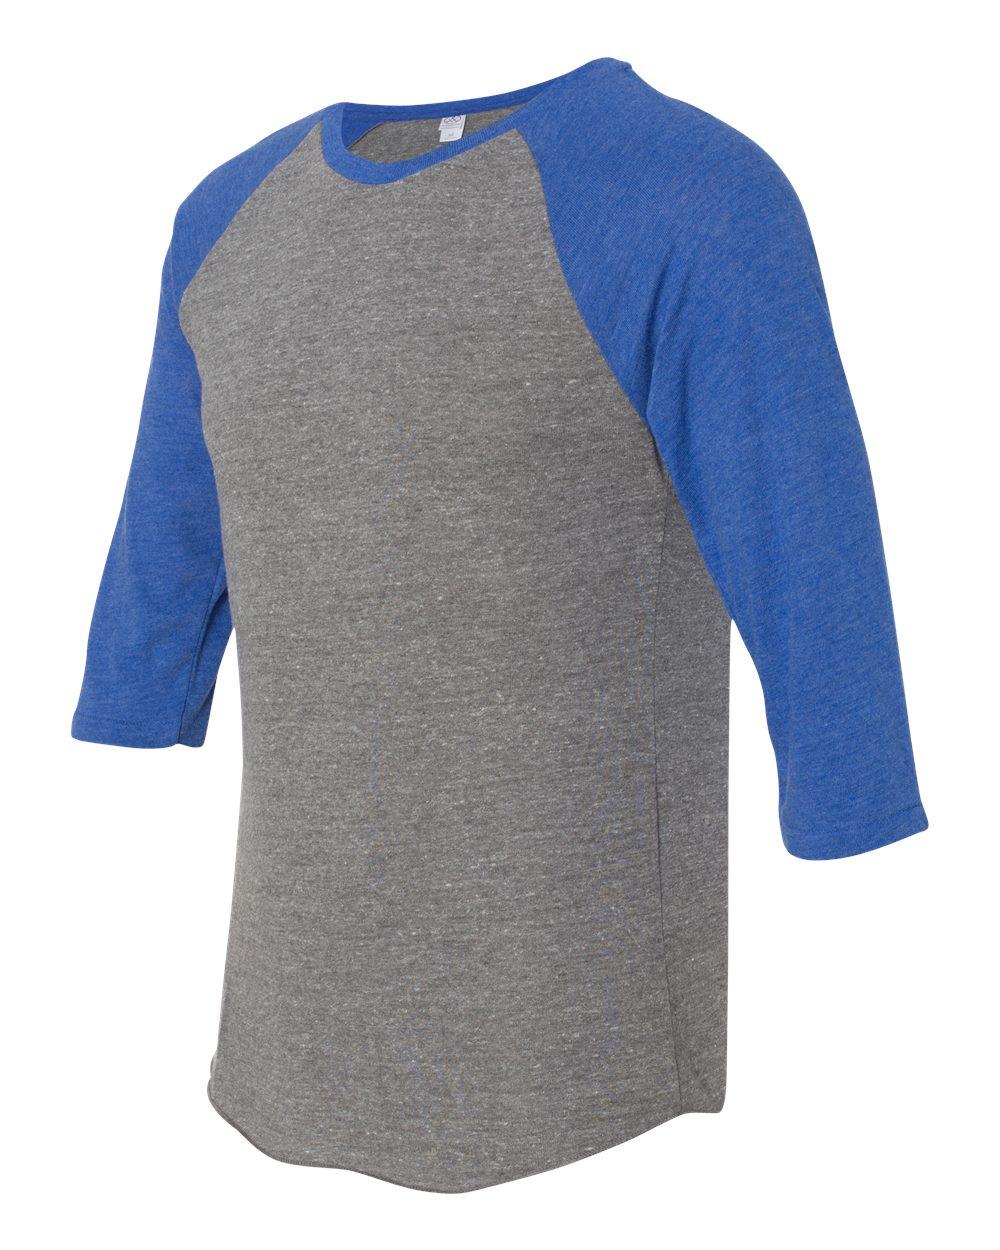 Alternative 20890 eco jersey baseball raglan t shirt for Sustainable t shirt printing